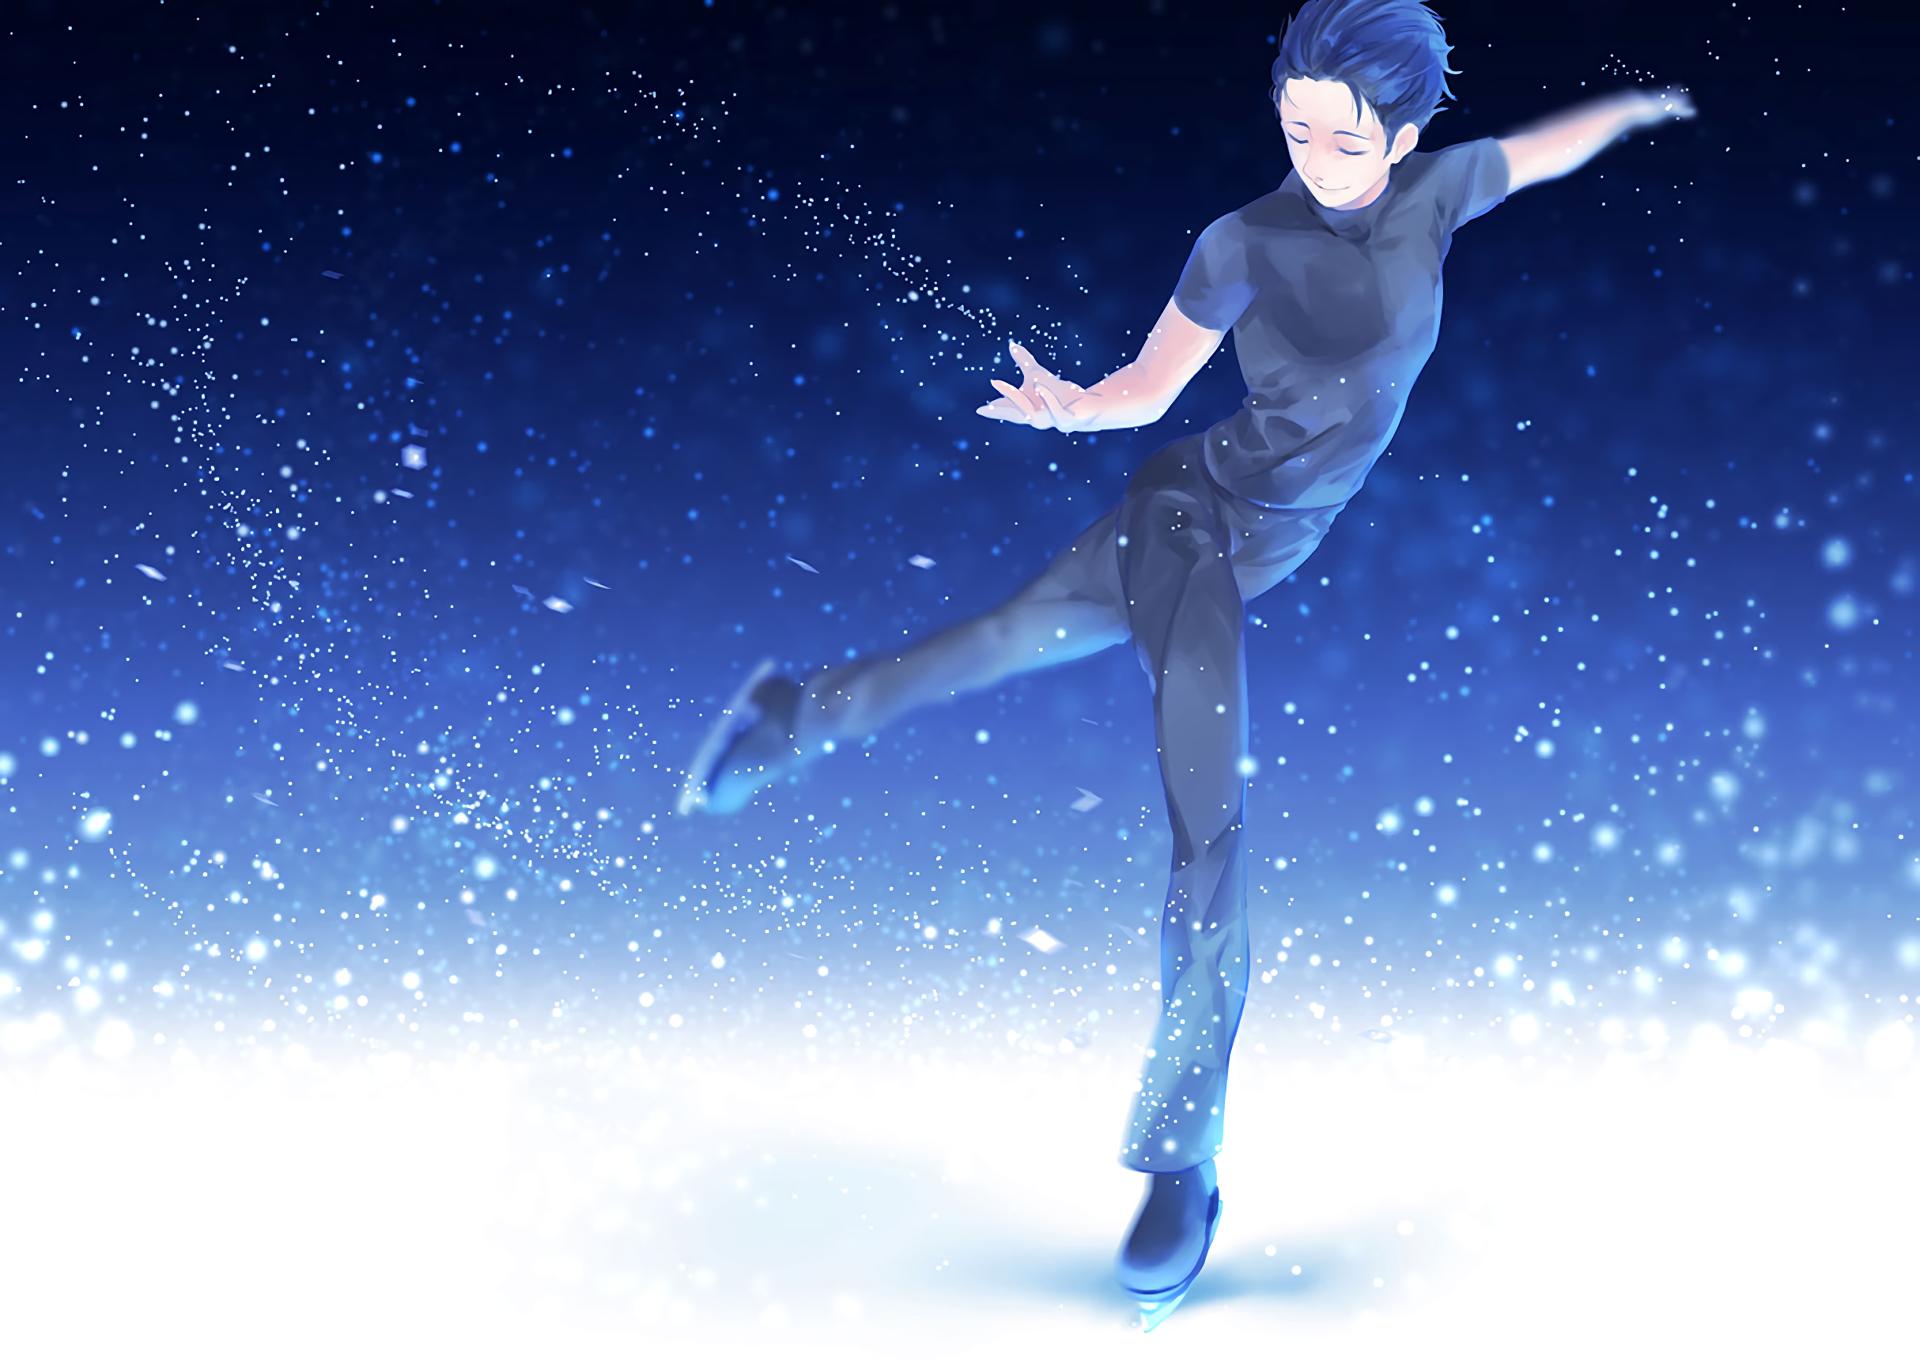 Anime Yuri On Ice Wallpaper